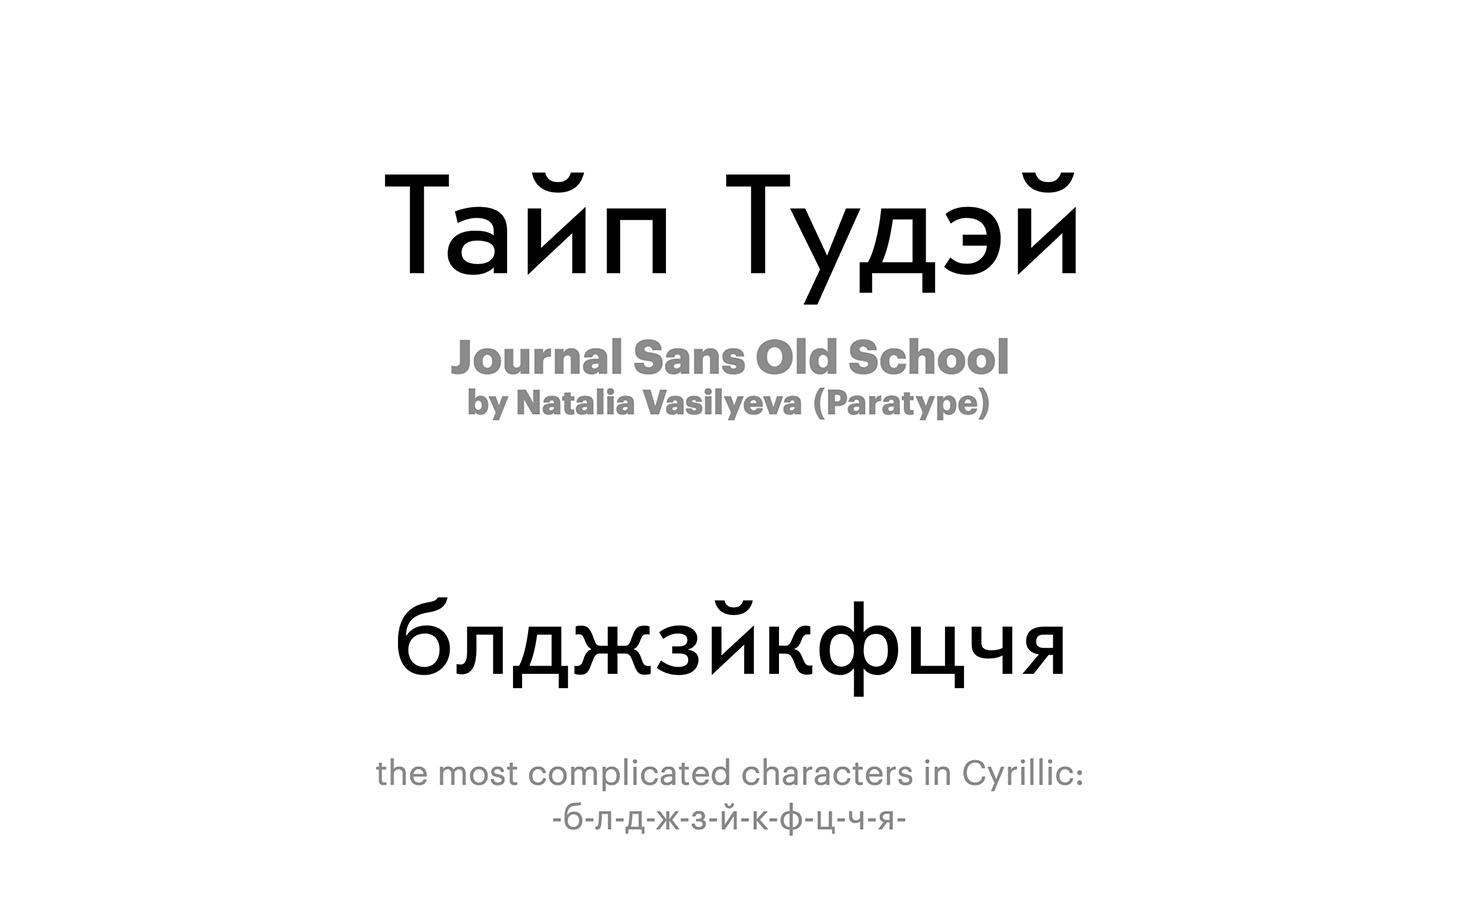 Journal-Sans-Old-School